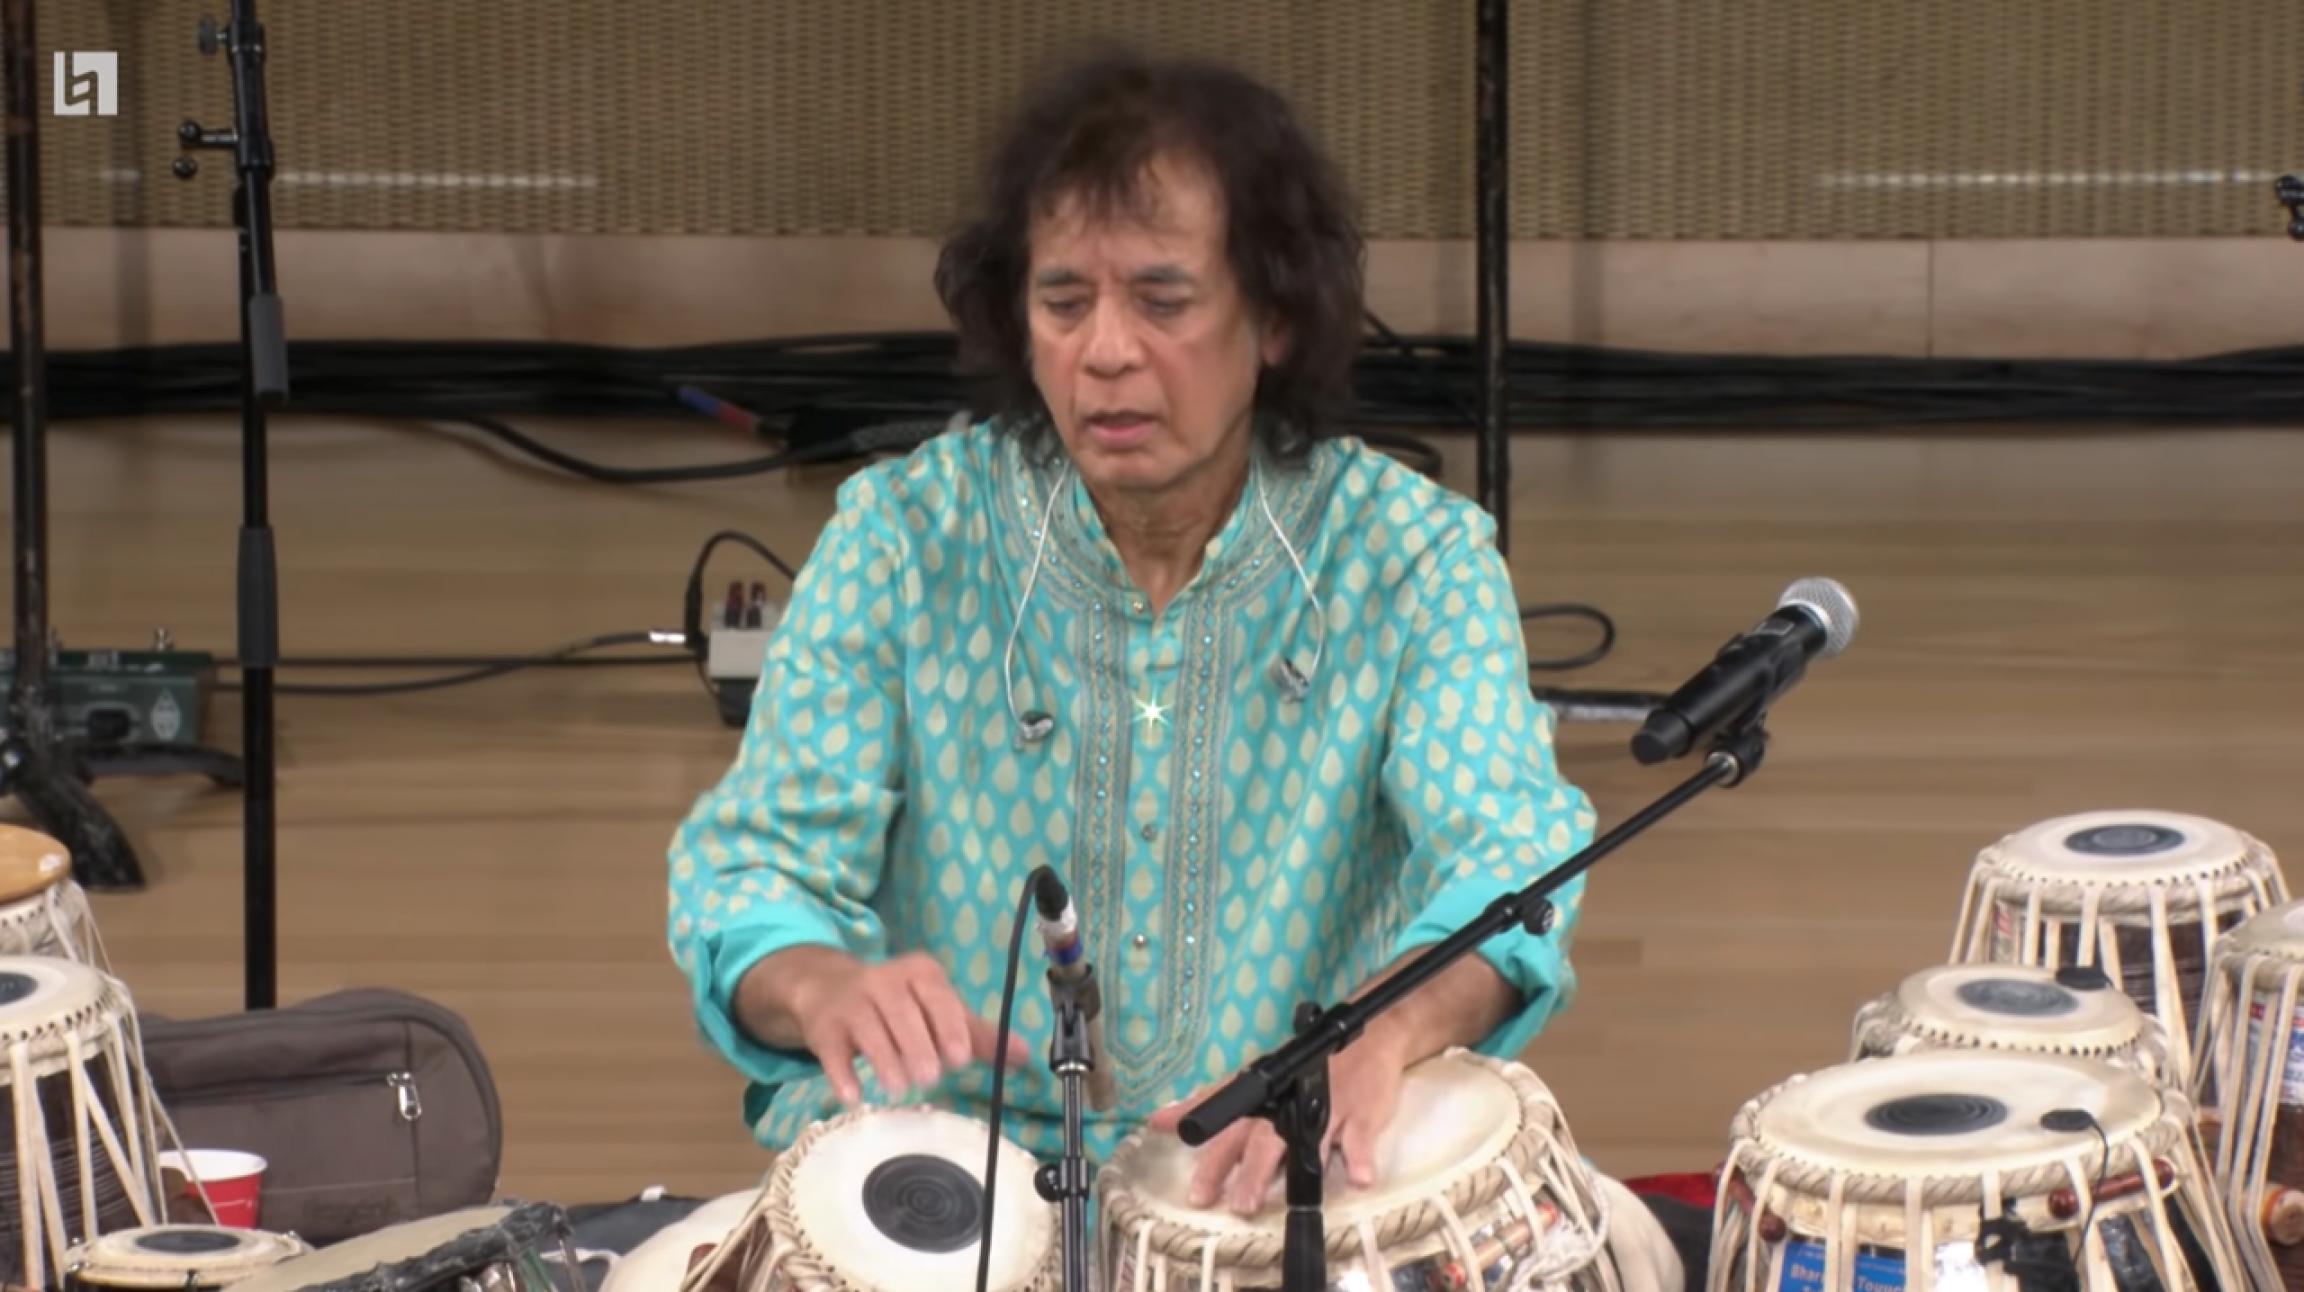 A man plays tabla while wearing a light blue shirt.